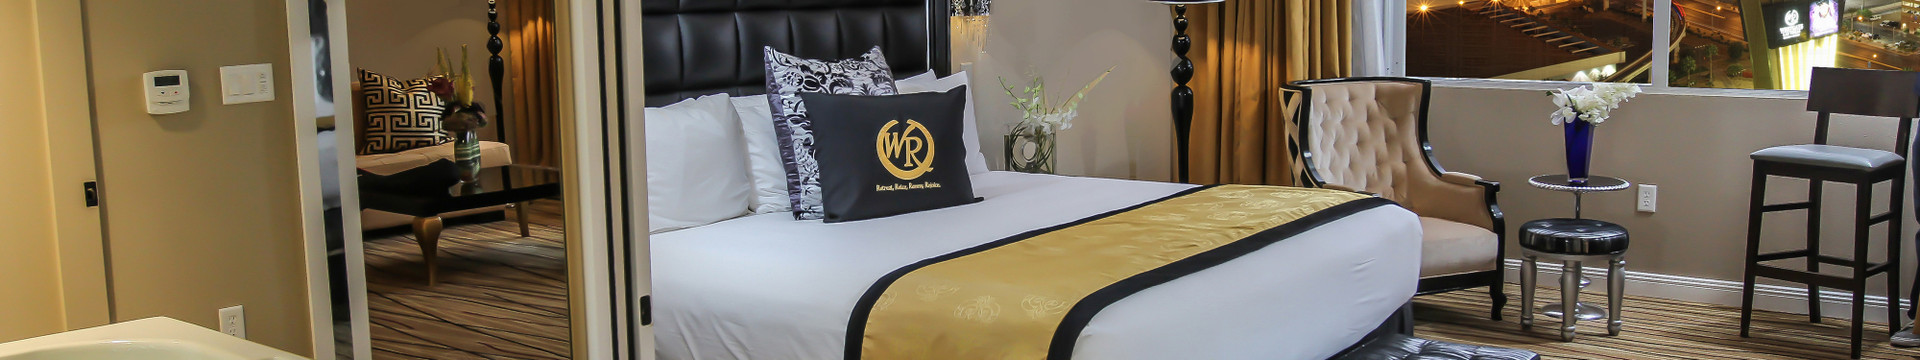 Las Vegas Suite - Westgate Las Vegas Resort